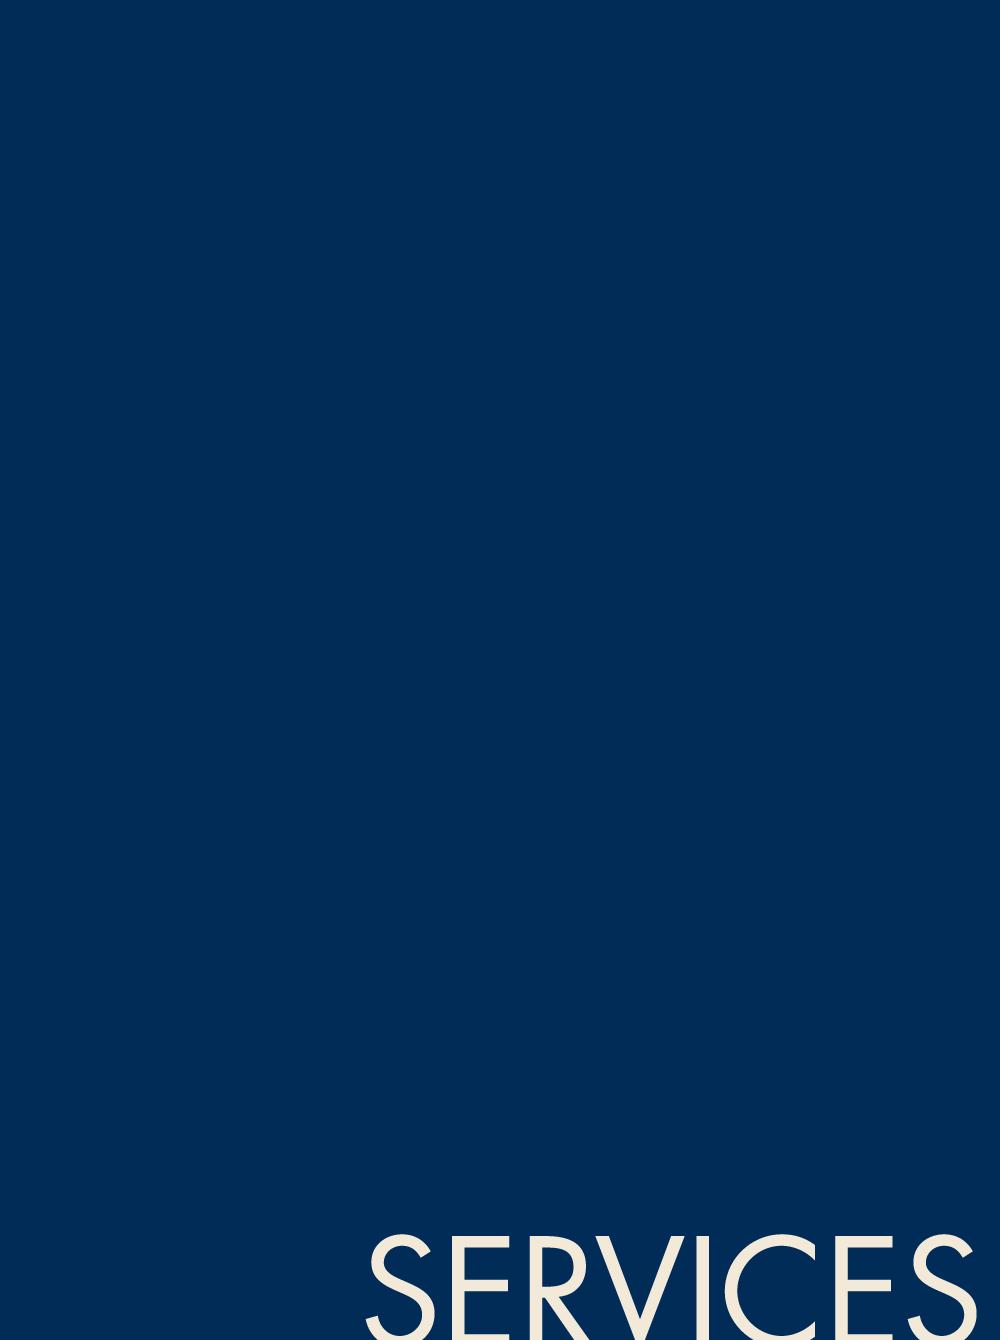 SERVICES   BRITT RICE ELECTRIC, LLP  THE INN AT QUARRY RIDGE  TEXAS MEASUREMENTS  ENTEC  COPY CORNER  AVALON TRANSPORTATION LA NY  A&M SUPER STORAGE  STAMPEDE COATINGS  ECO ZAPP PEST AND TERMITE  GREEN TEAMS, INC.  EVOLVE  HERWALD PEST CONTROL  NEWMAN PRINTING  HUNTERS CANYON ANIMAL HOSPITAL  ALL PRO RUSH  XTRIA  LEGACY POOL DESIGNS  VANCE EXCAVATION  VETERINARY ANESTHESIA & PAIN MANAGEMENT  TEXAS ELITE LOGISTICS  TMG COMPANY  STUDIO ONE PHOTOGRAPHY  SLANTON MATERIAL SERVICES  SWICO  REPUBLIC LANDSCAPES  PARTNERS, LLC  MG ACTIVE  ALL PRO RUSH - ATLANTA GA.  HELMCAMP MATERIALS, LTD.